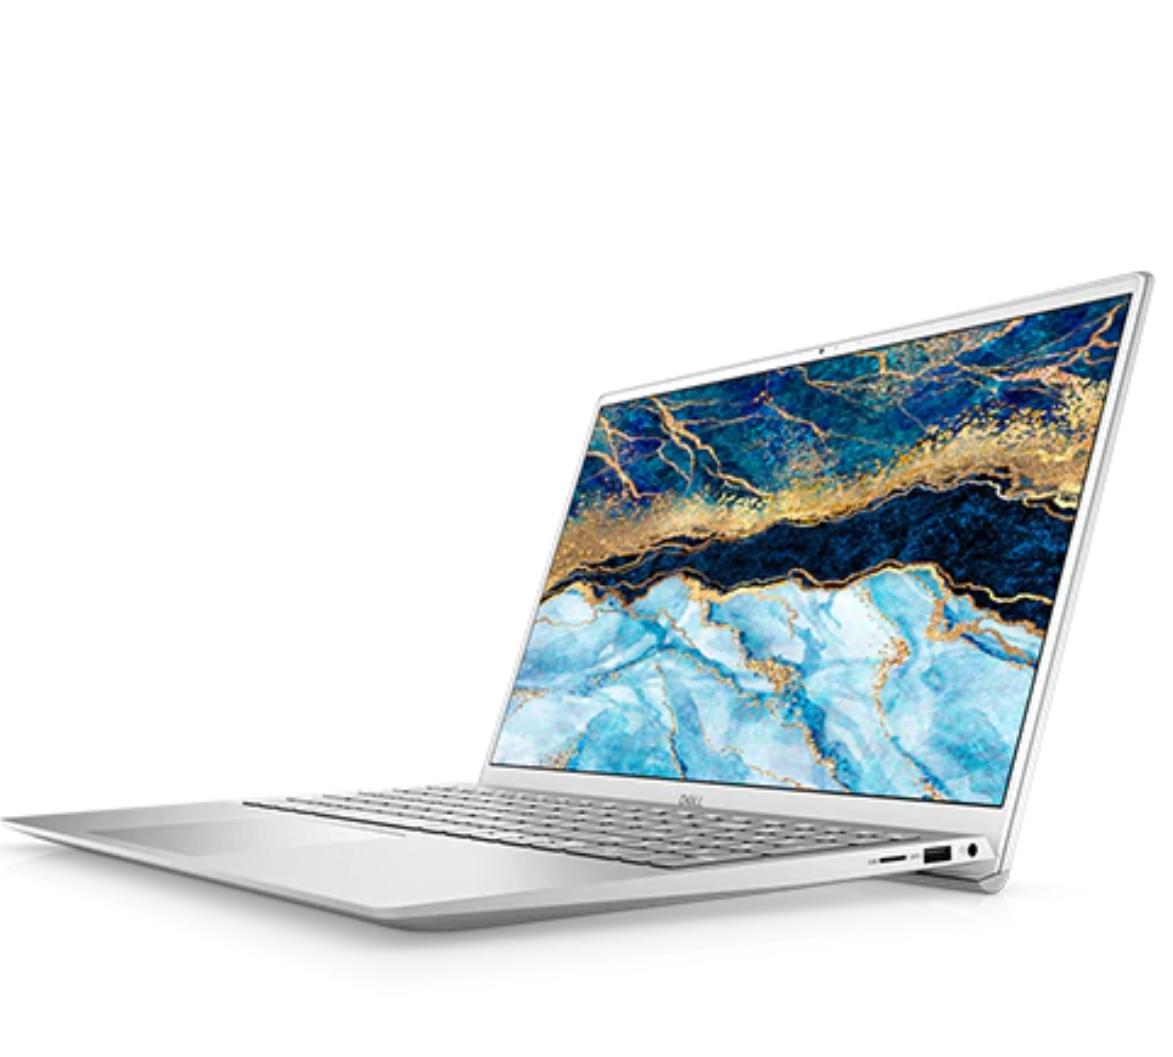 Dell Inspiron 15 5000 Laptop (i5-1135G7, 8GB RAM, 256GB SSD)